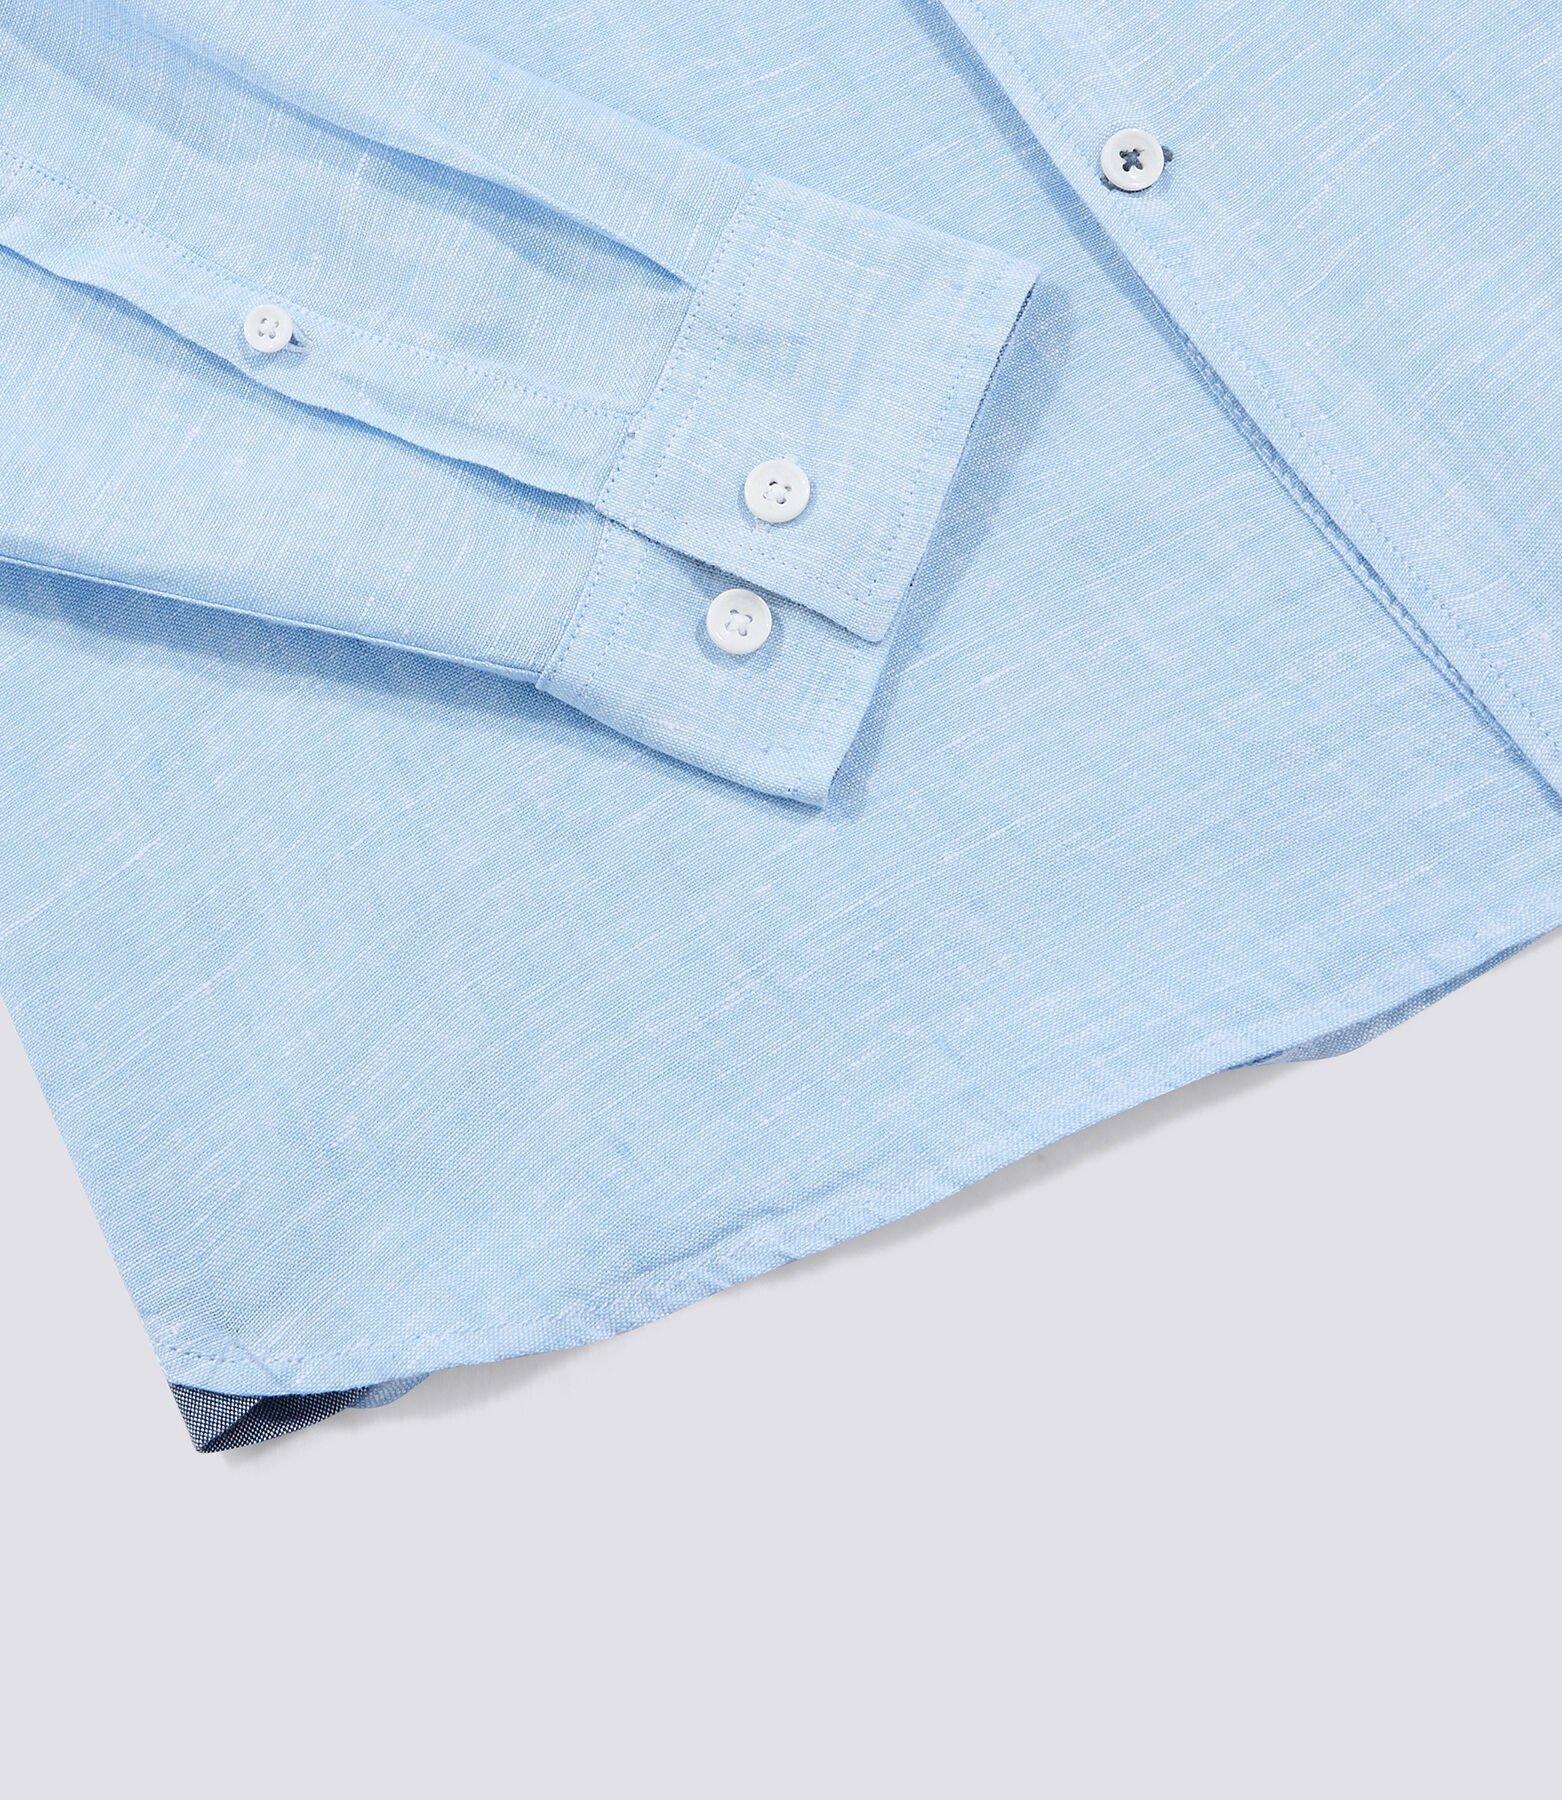 Chemise Sportswear Bleu Ciel